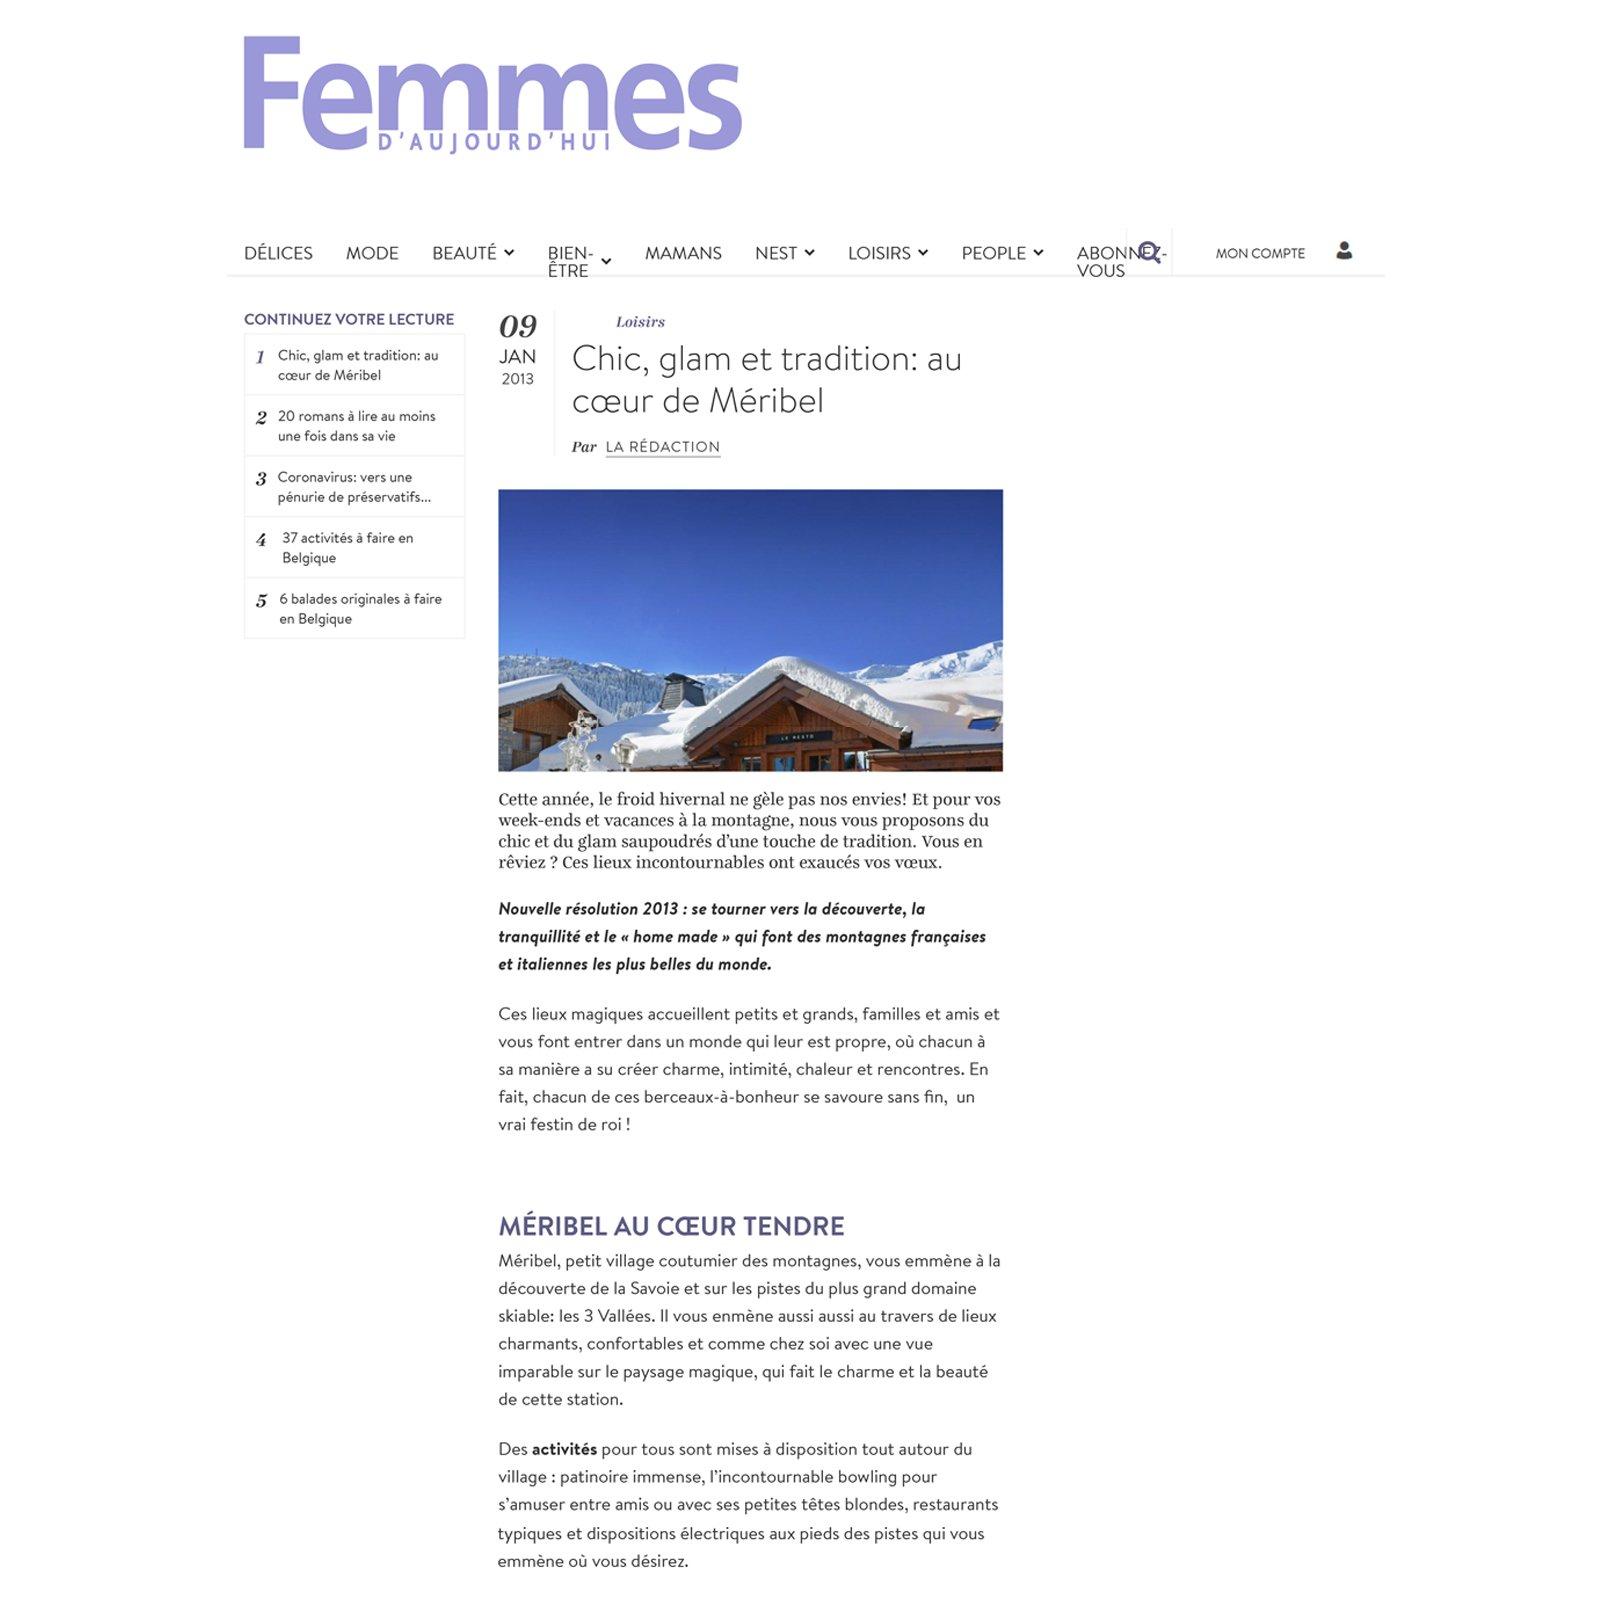 PRESSE FEMME D'AUJOURD'HUI Article HOTEL 4 etoiles stephanie cayet architecture interieure design